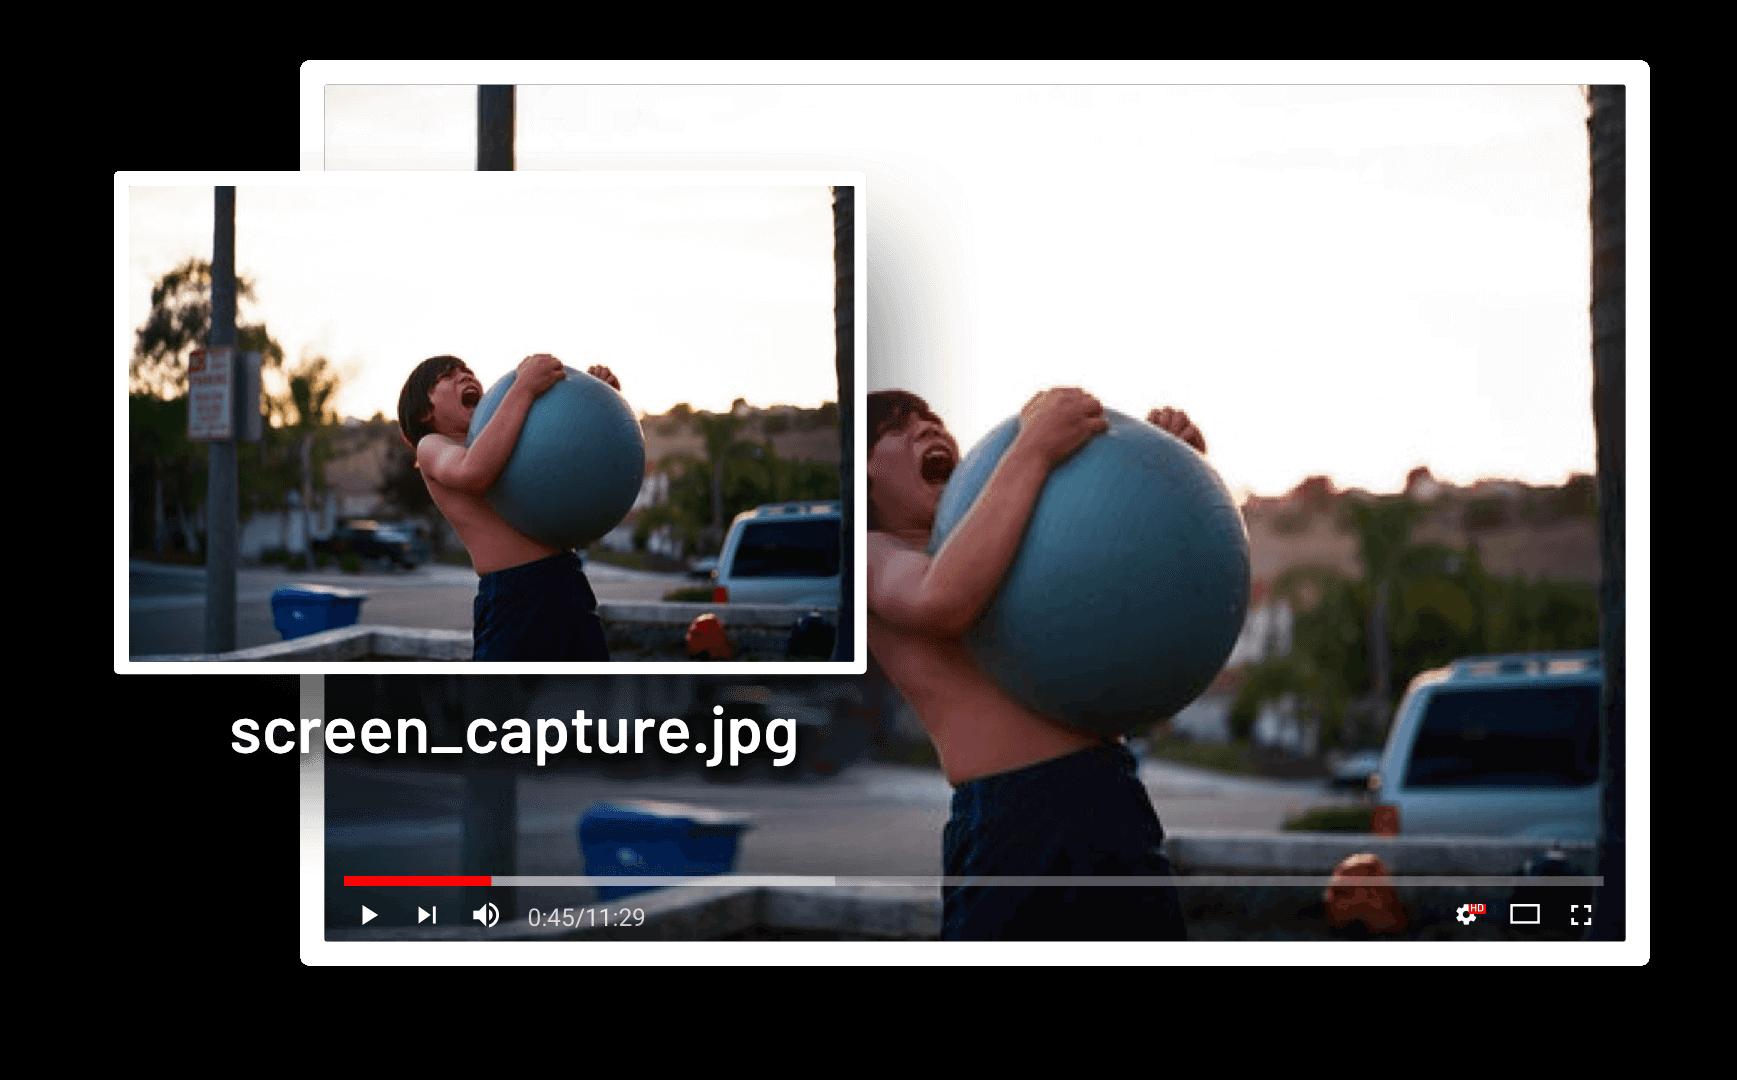 Capture Image